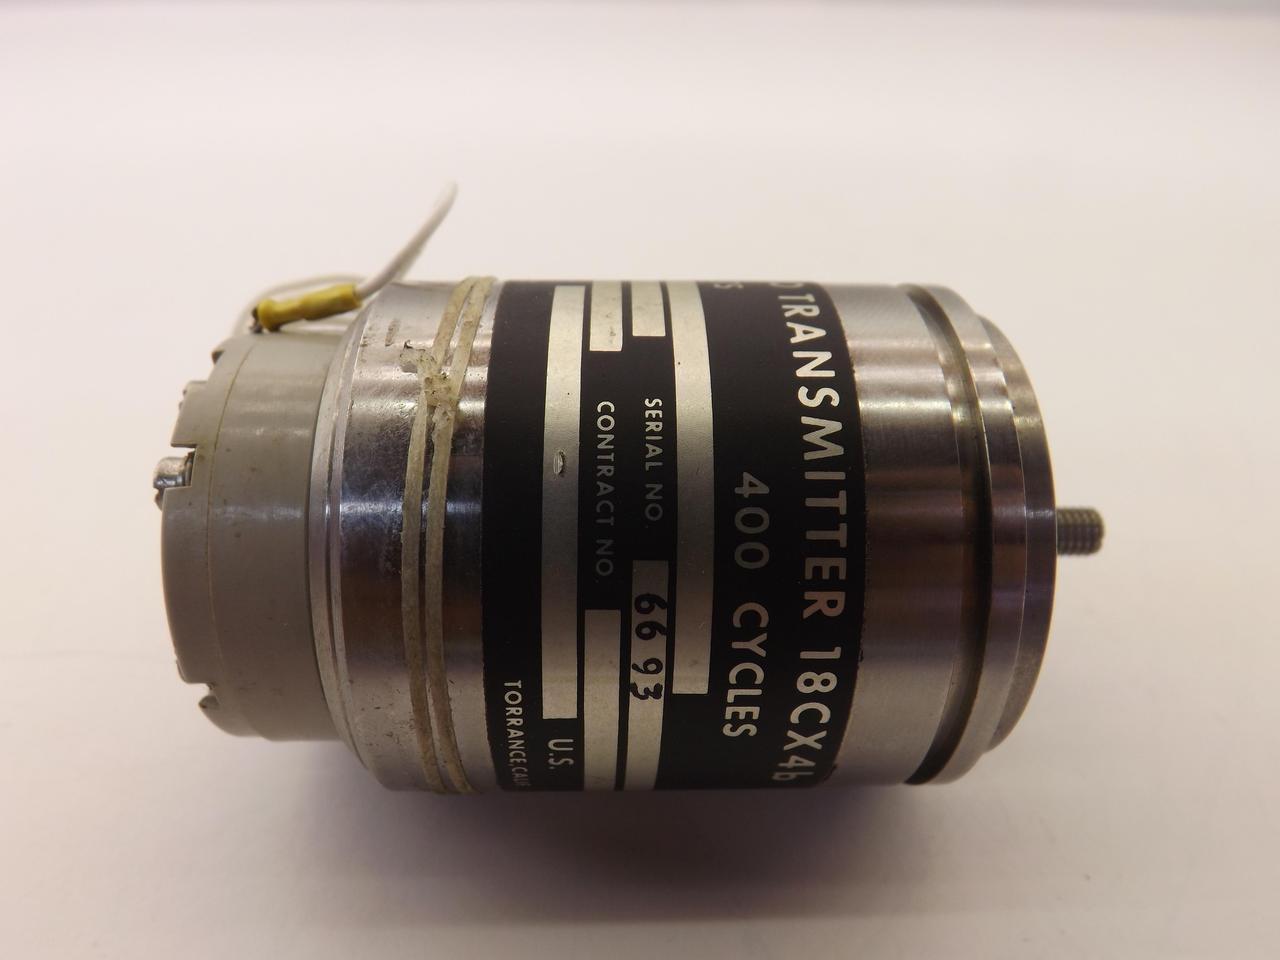 Vernitron 18CX4b Synchro Transmitter T36146